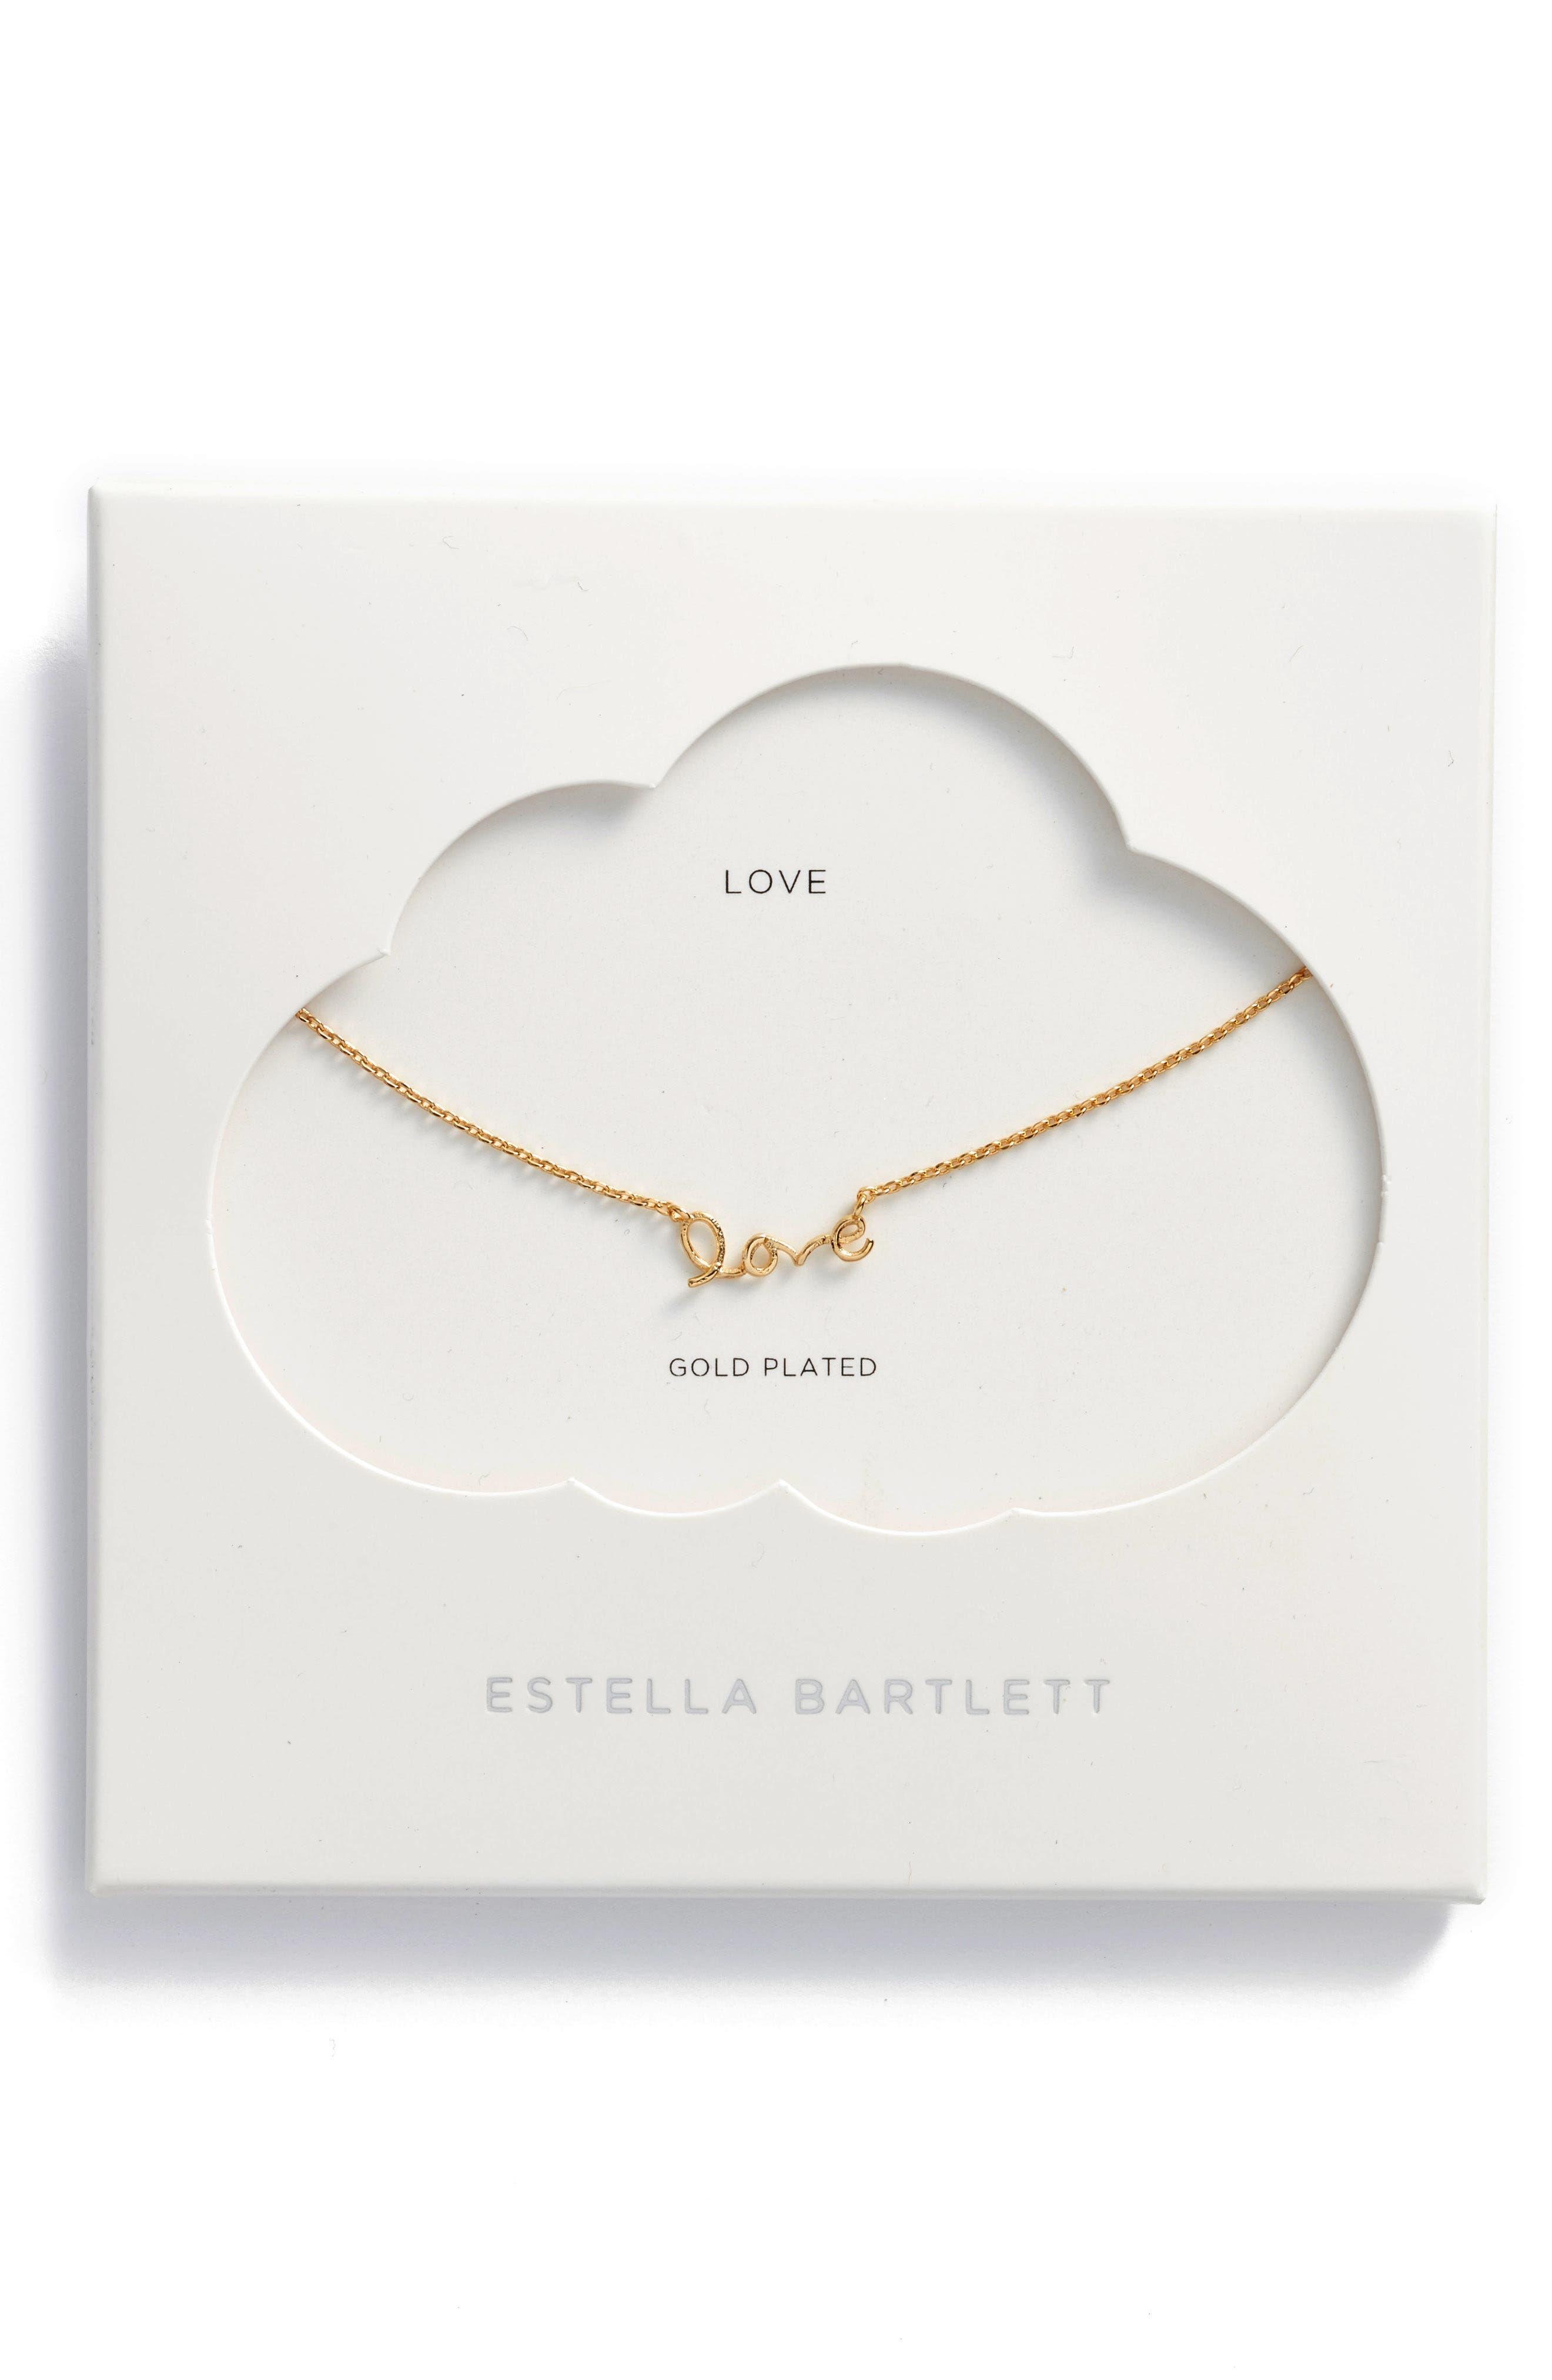 Main Image - Estella Bartlett Love Pendant Necklace